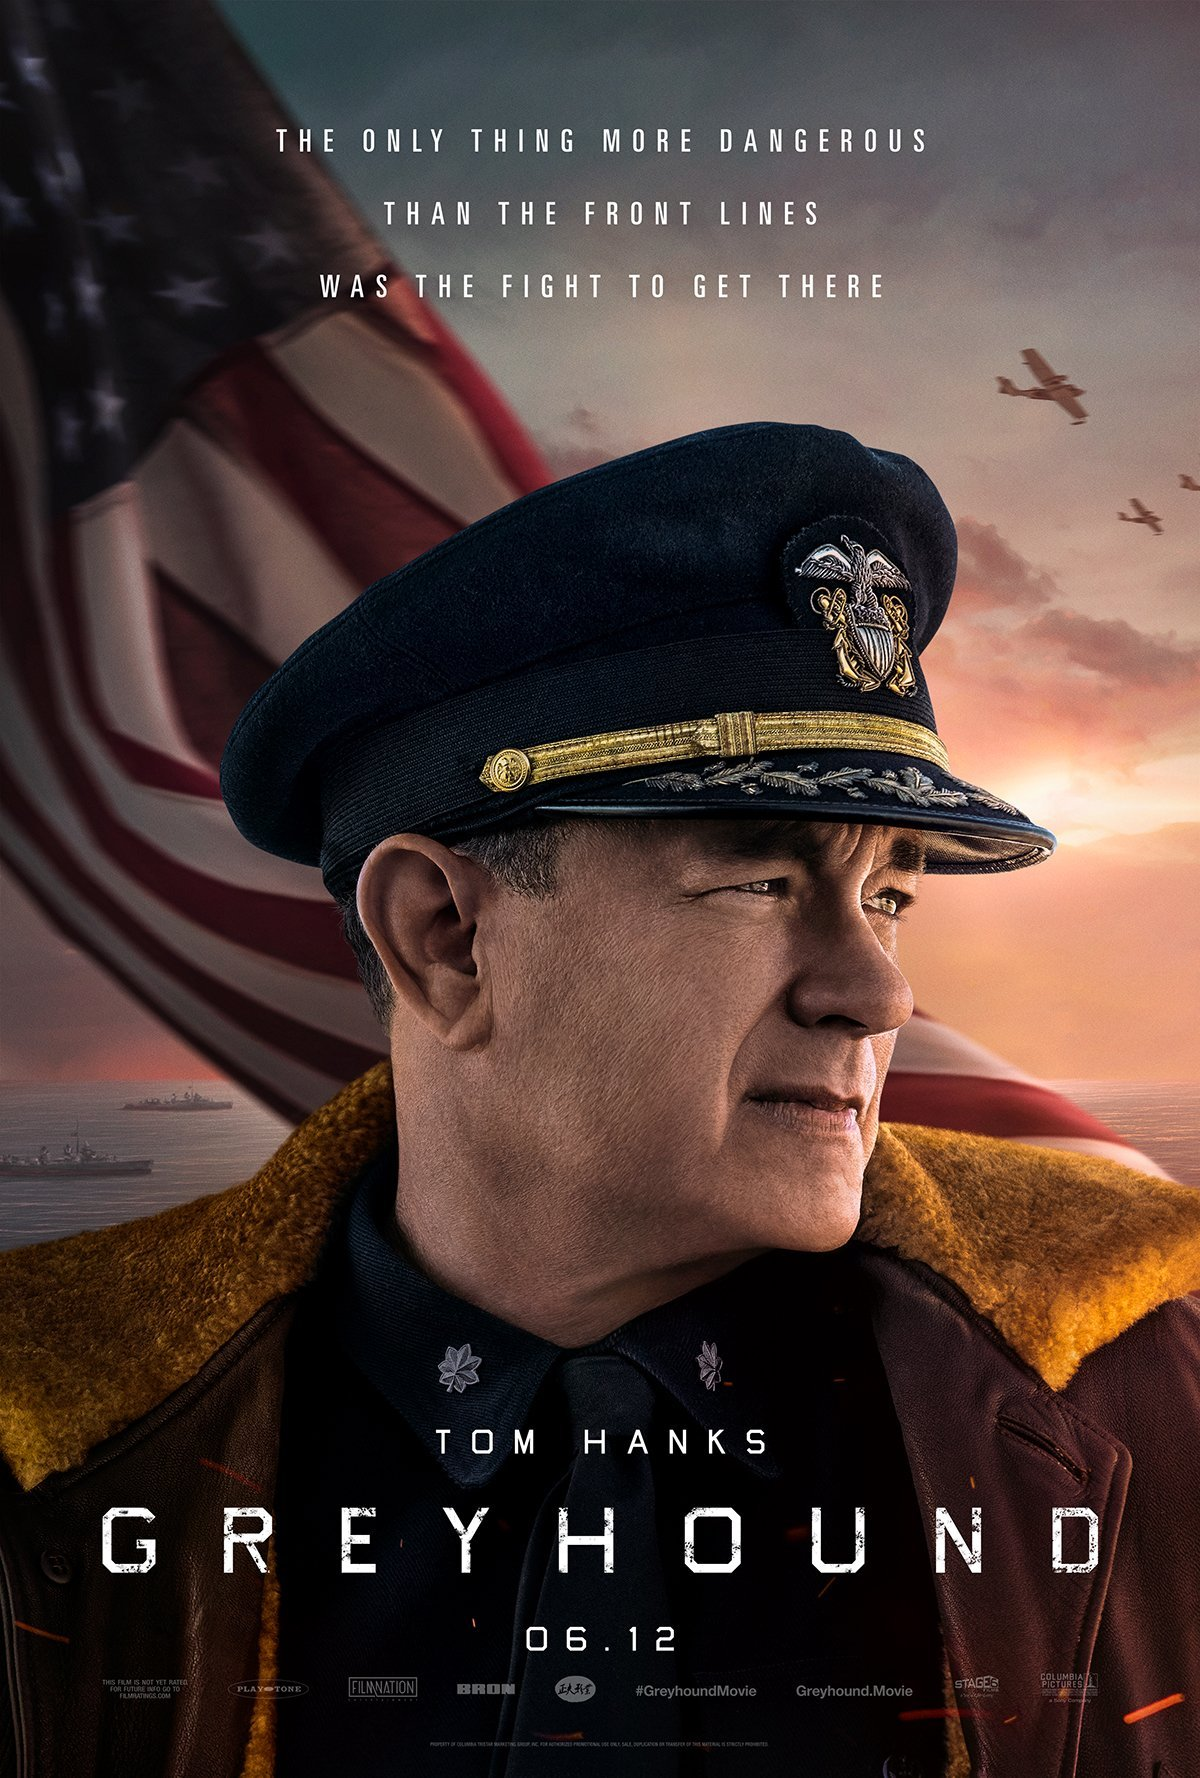 greyhound movie poster tom hanks